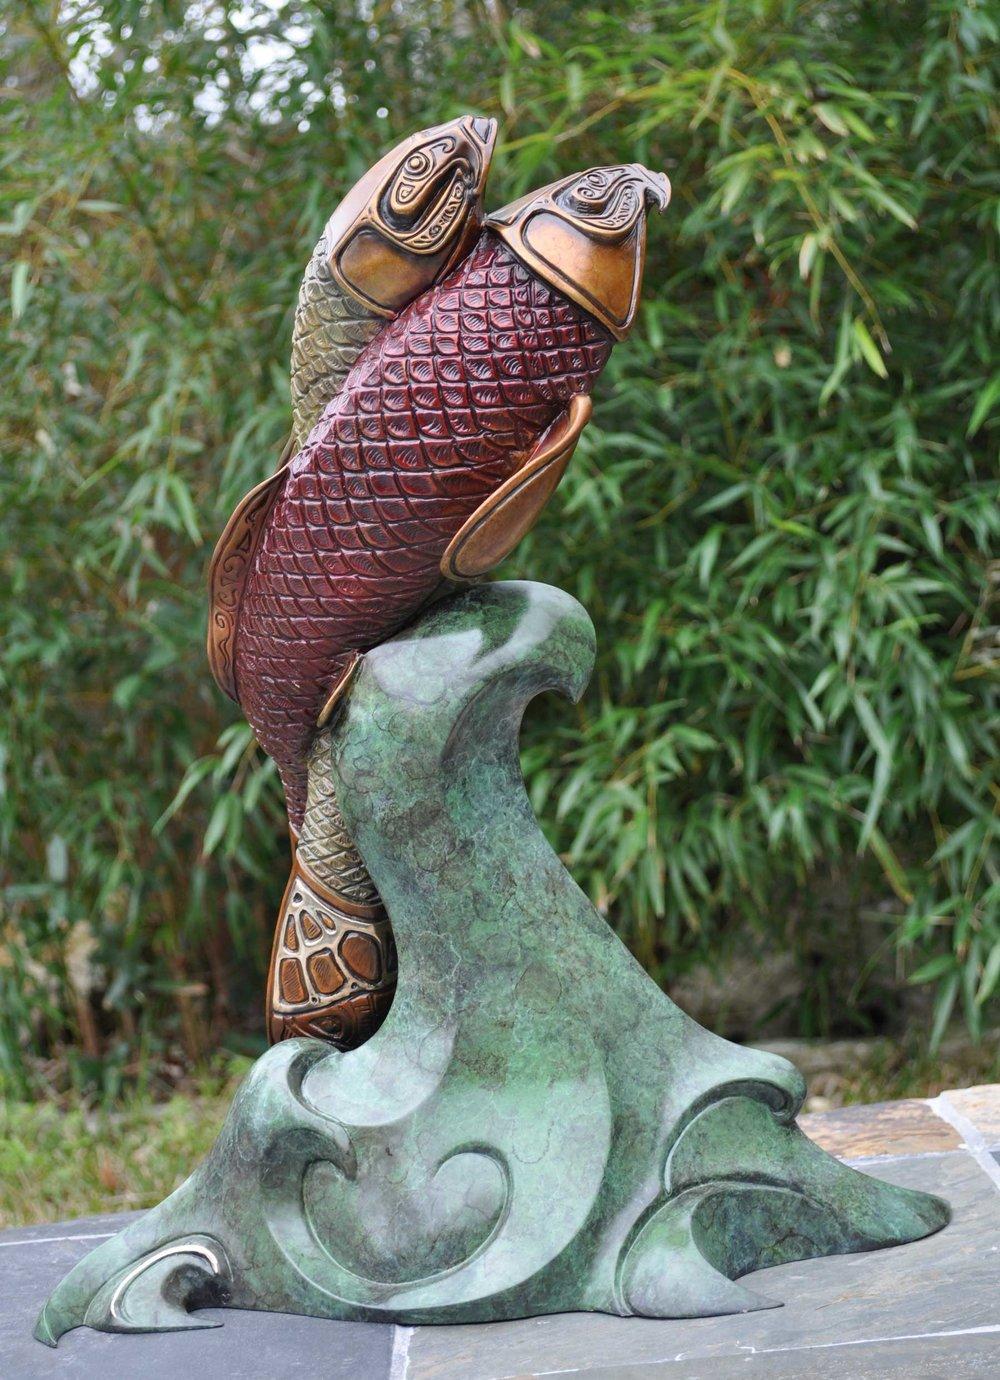 bronz-koi-fountain-sculpture-john-maisano-3.jpg